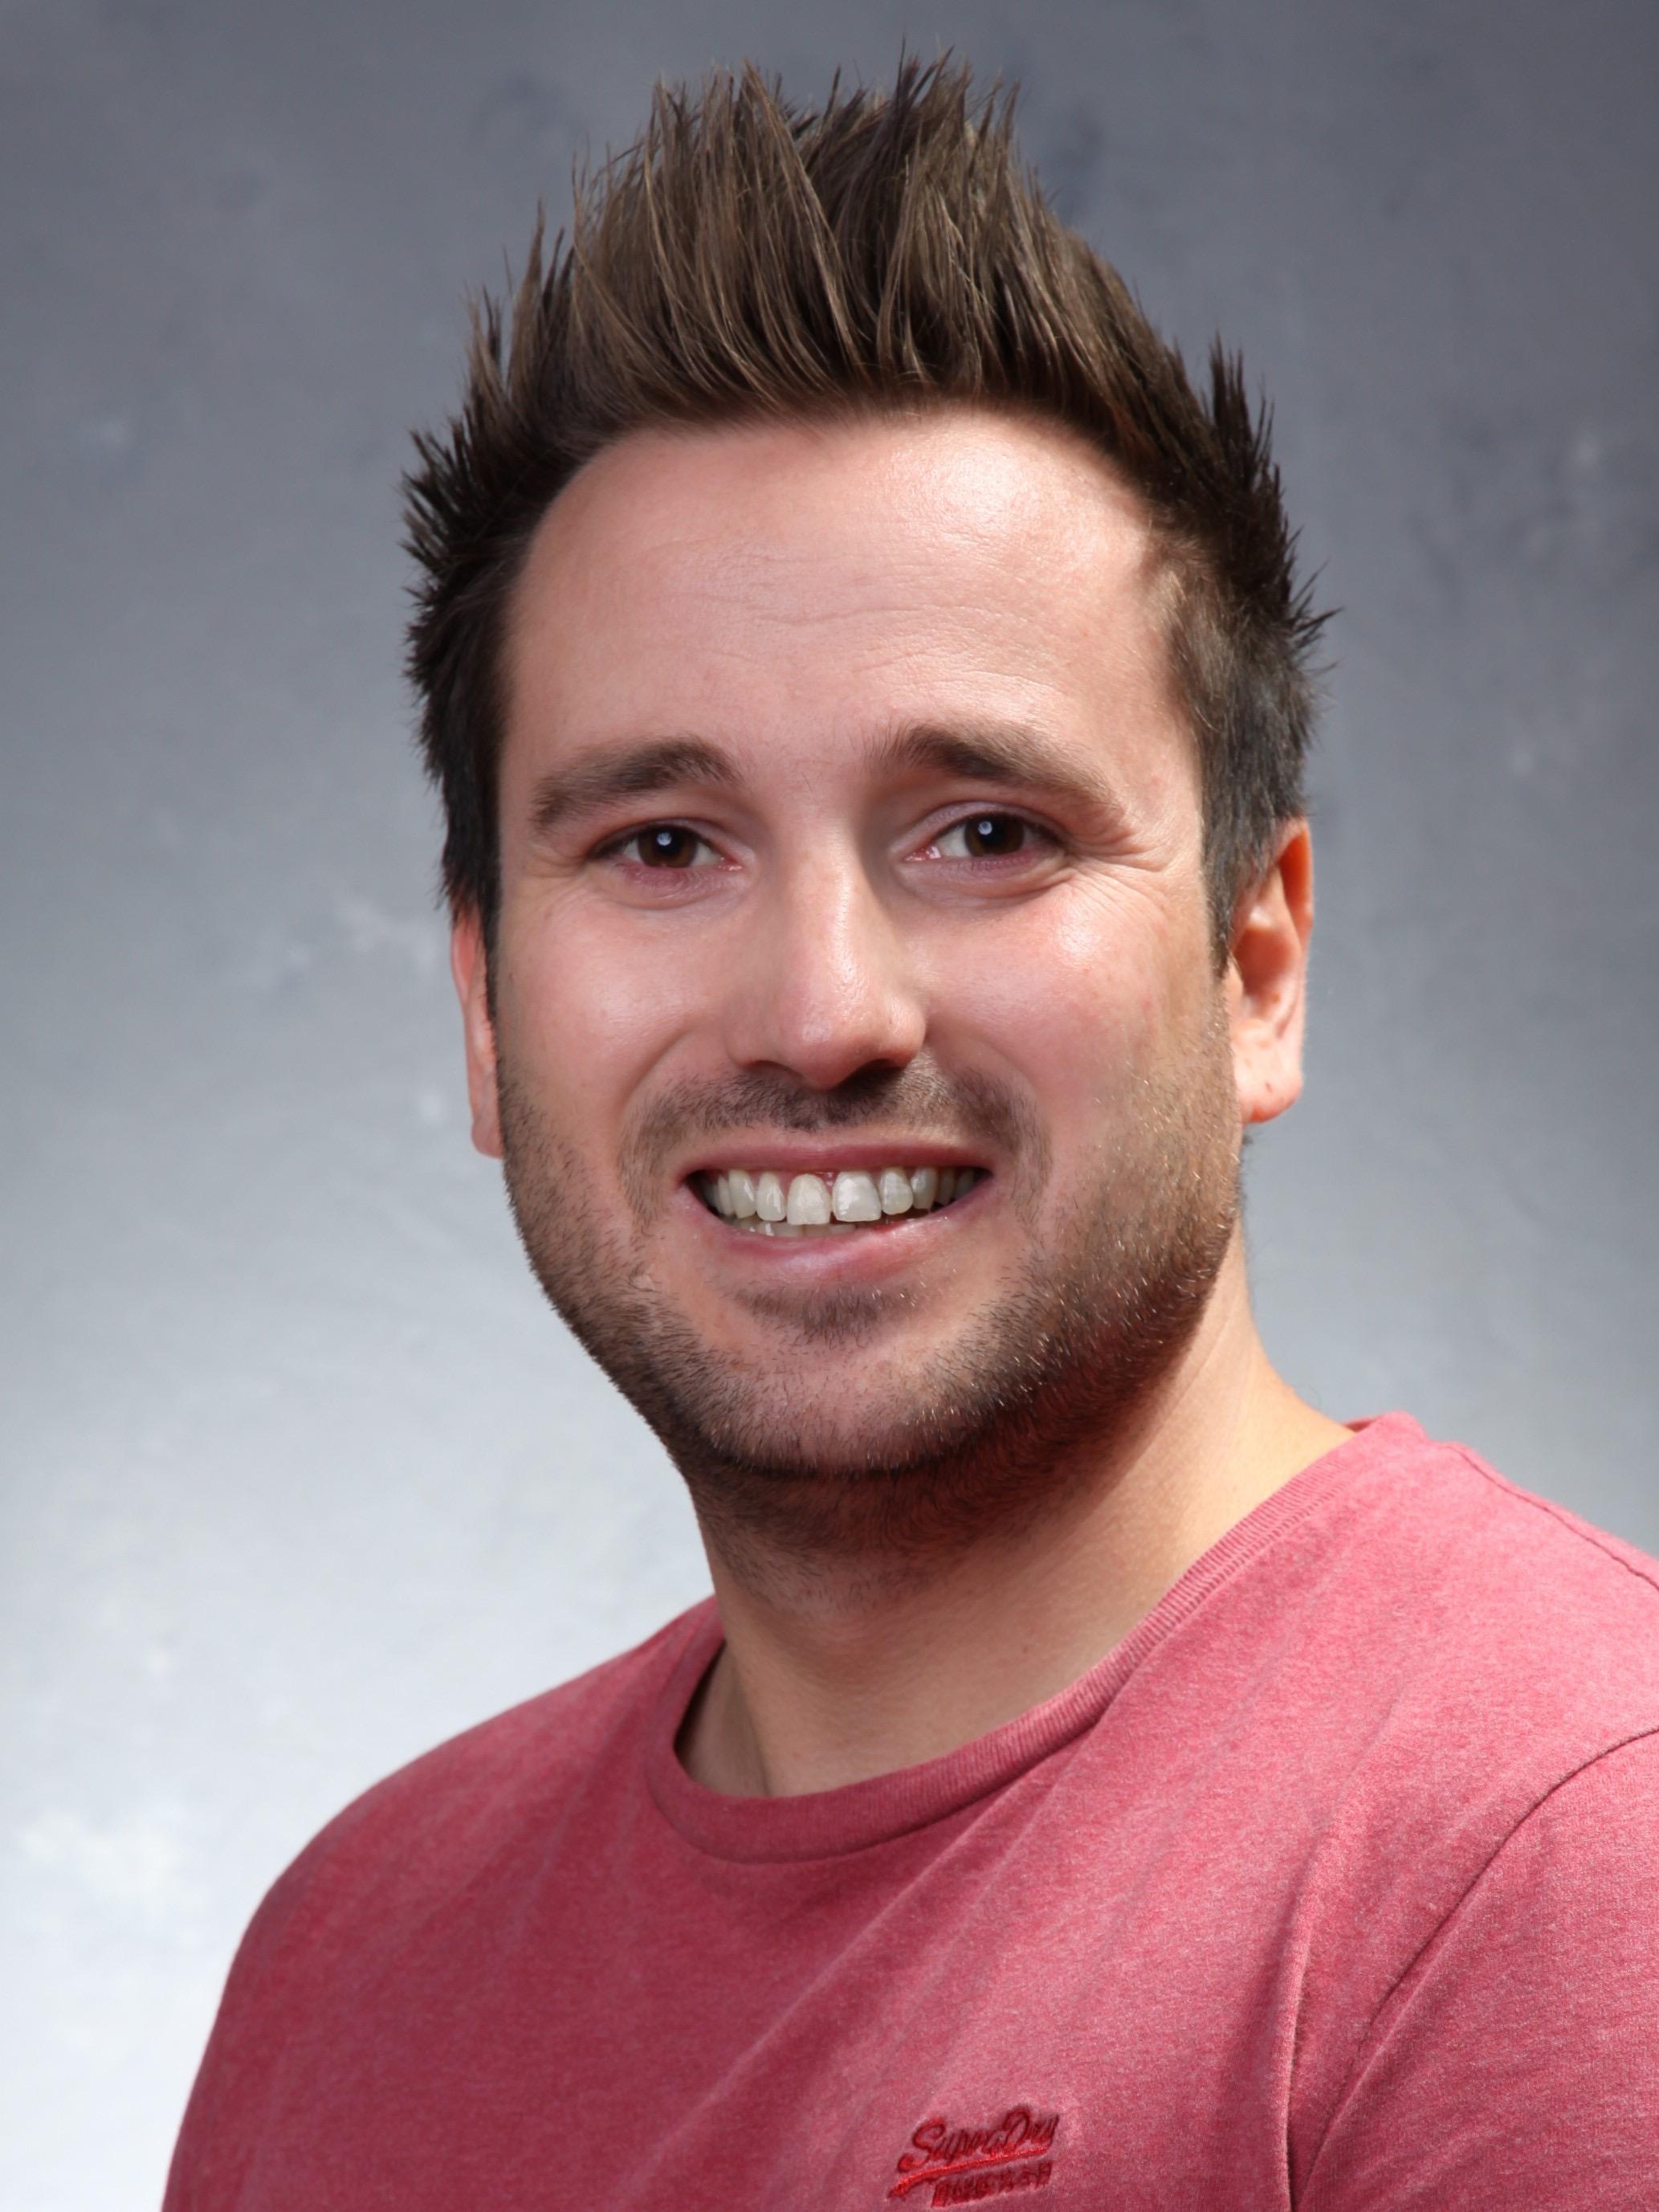 Tobias Fenske